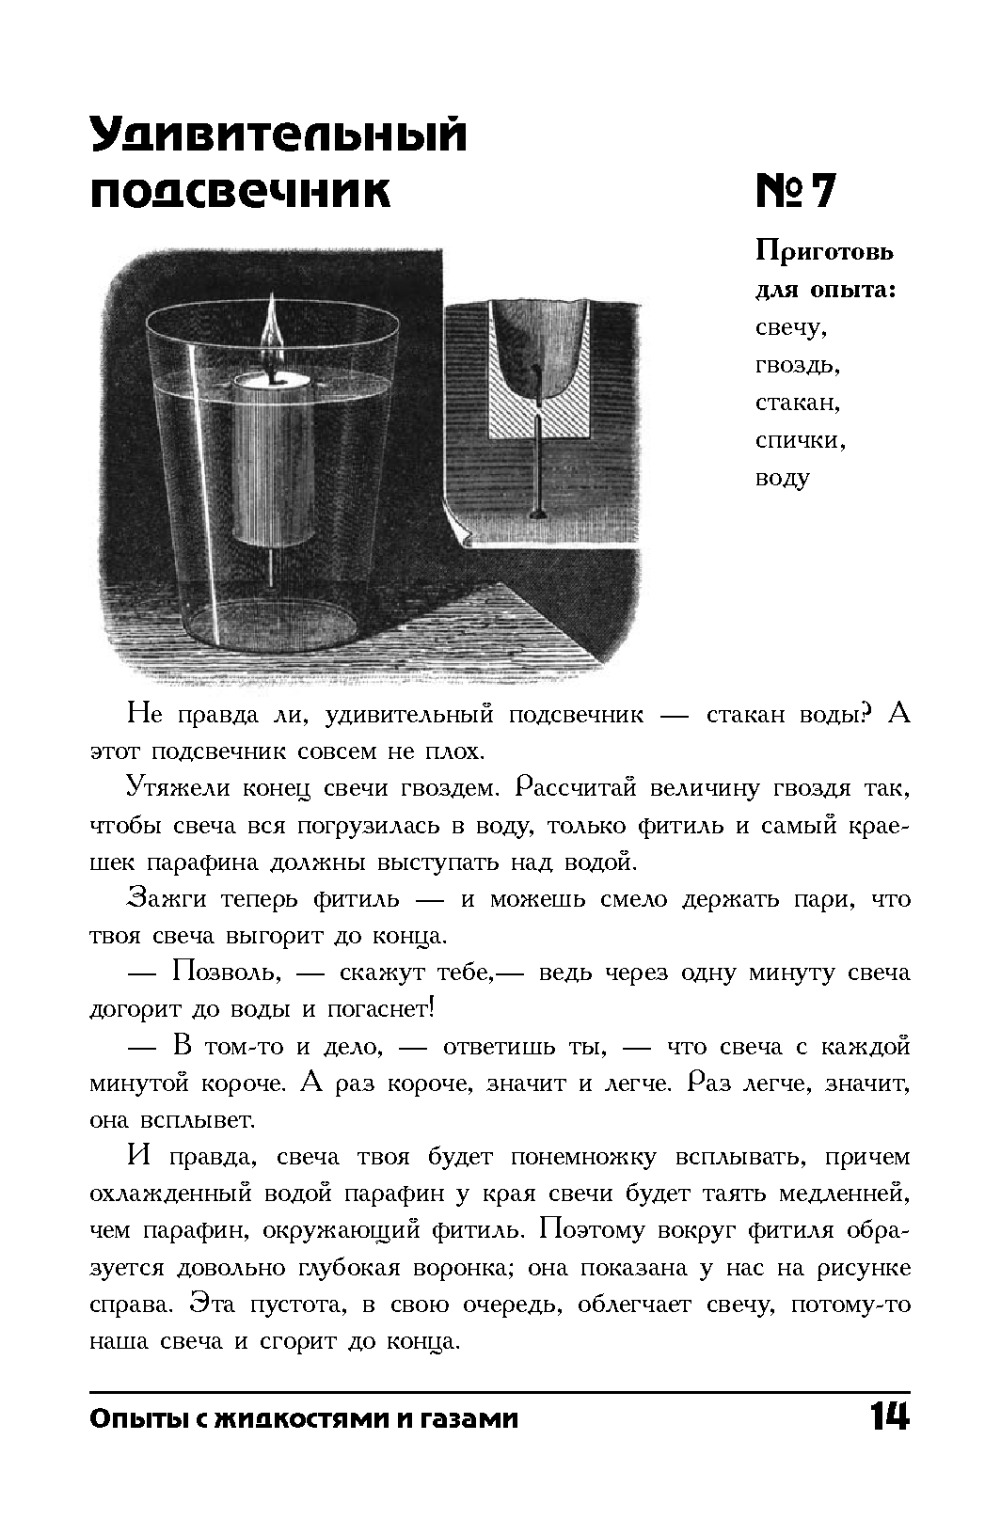 http://i1.imageban.ru/out/2013/10/28/ec50842e9b3c975a6f286aa7713c5e47.jpg